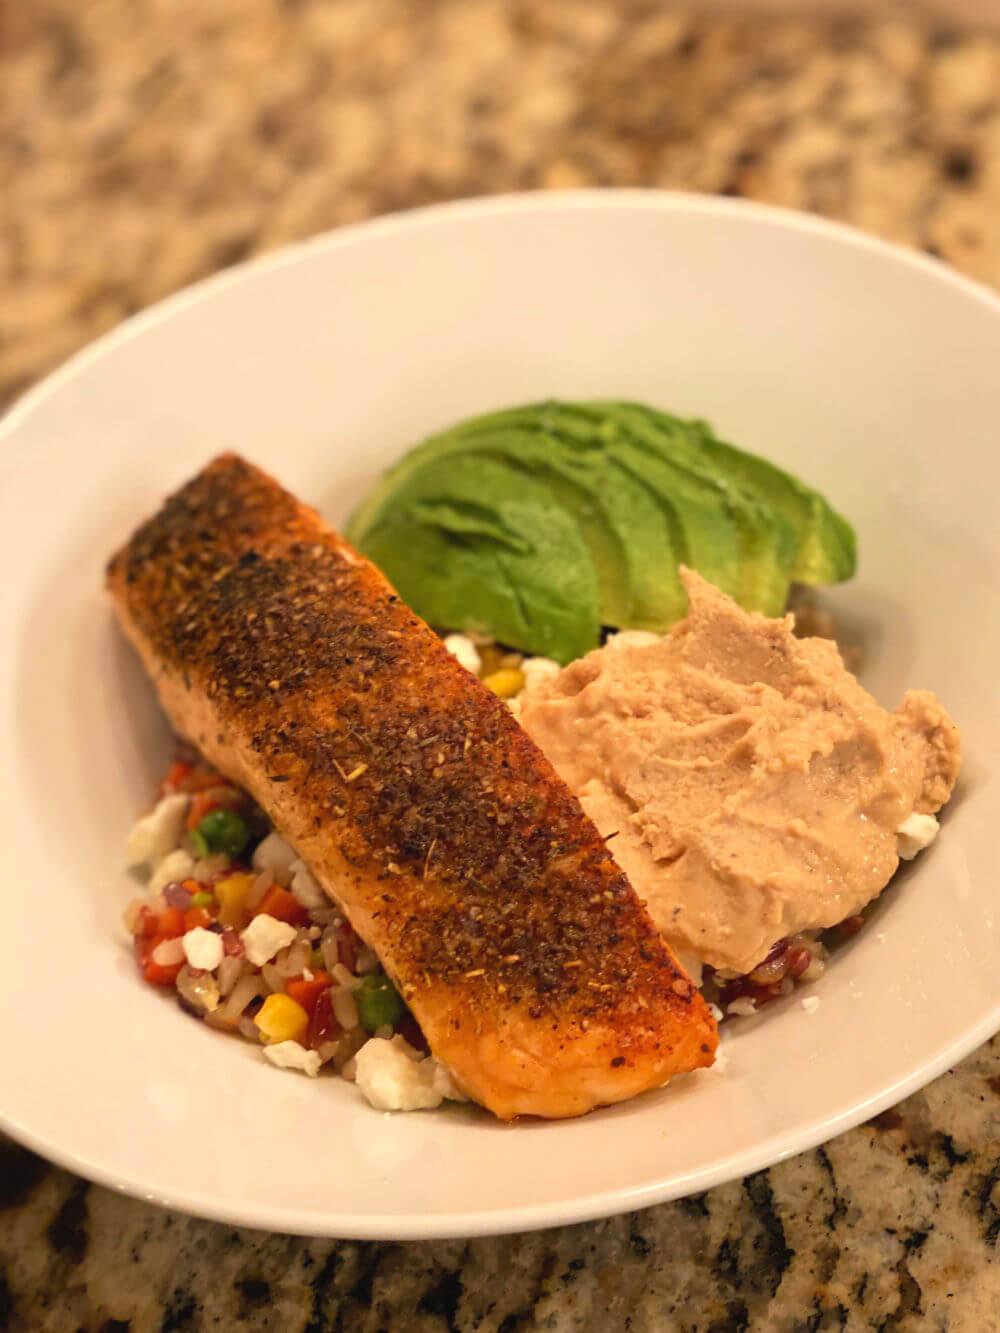 salmon and multigrain vegetable blend bowl